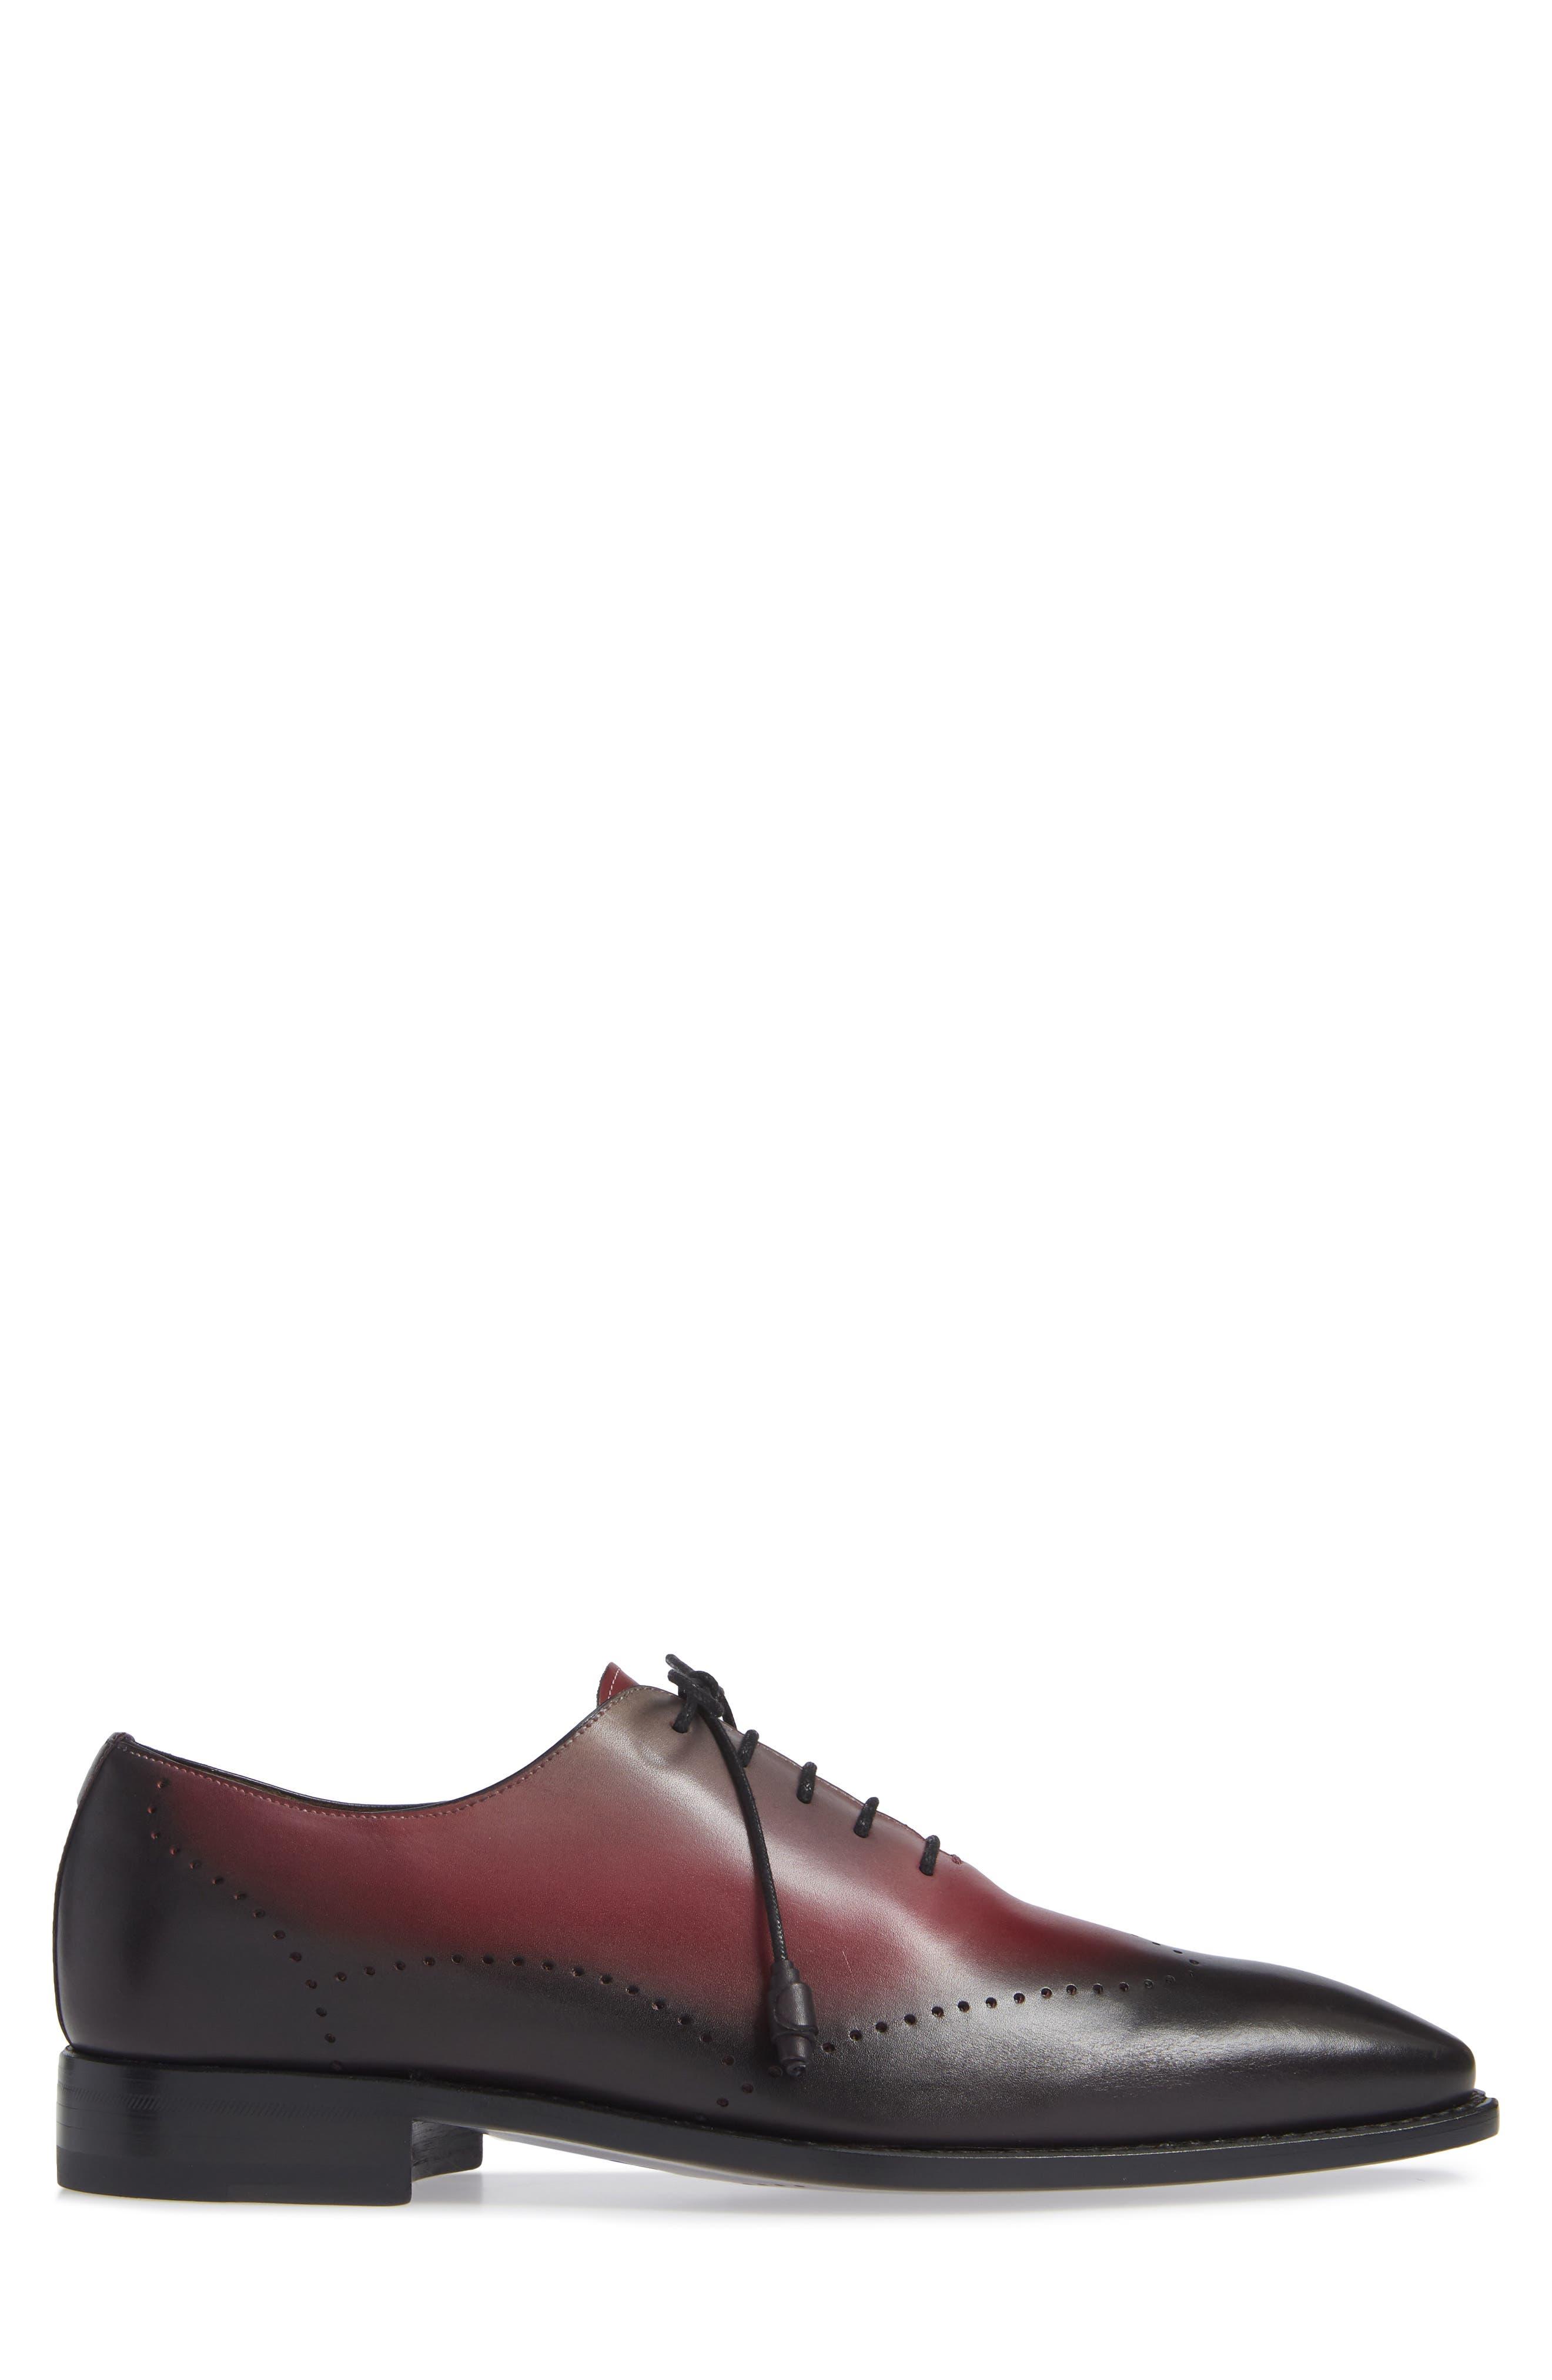 Addy Wingtip Whole Cut Shoe,                             Alternate thumbnail 3, color,                             BLACK LEATHER